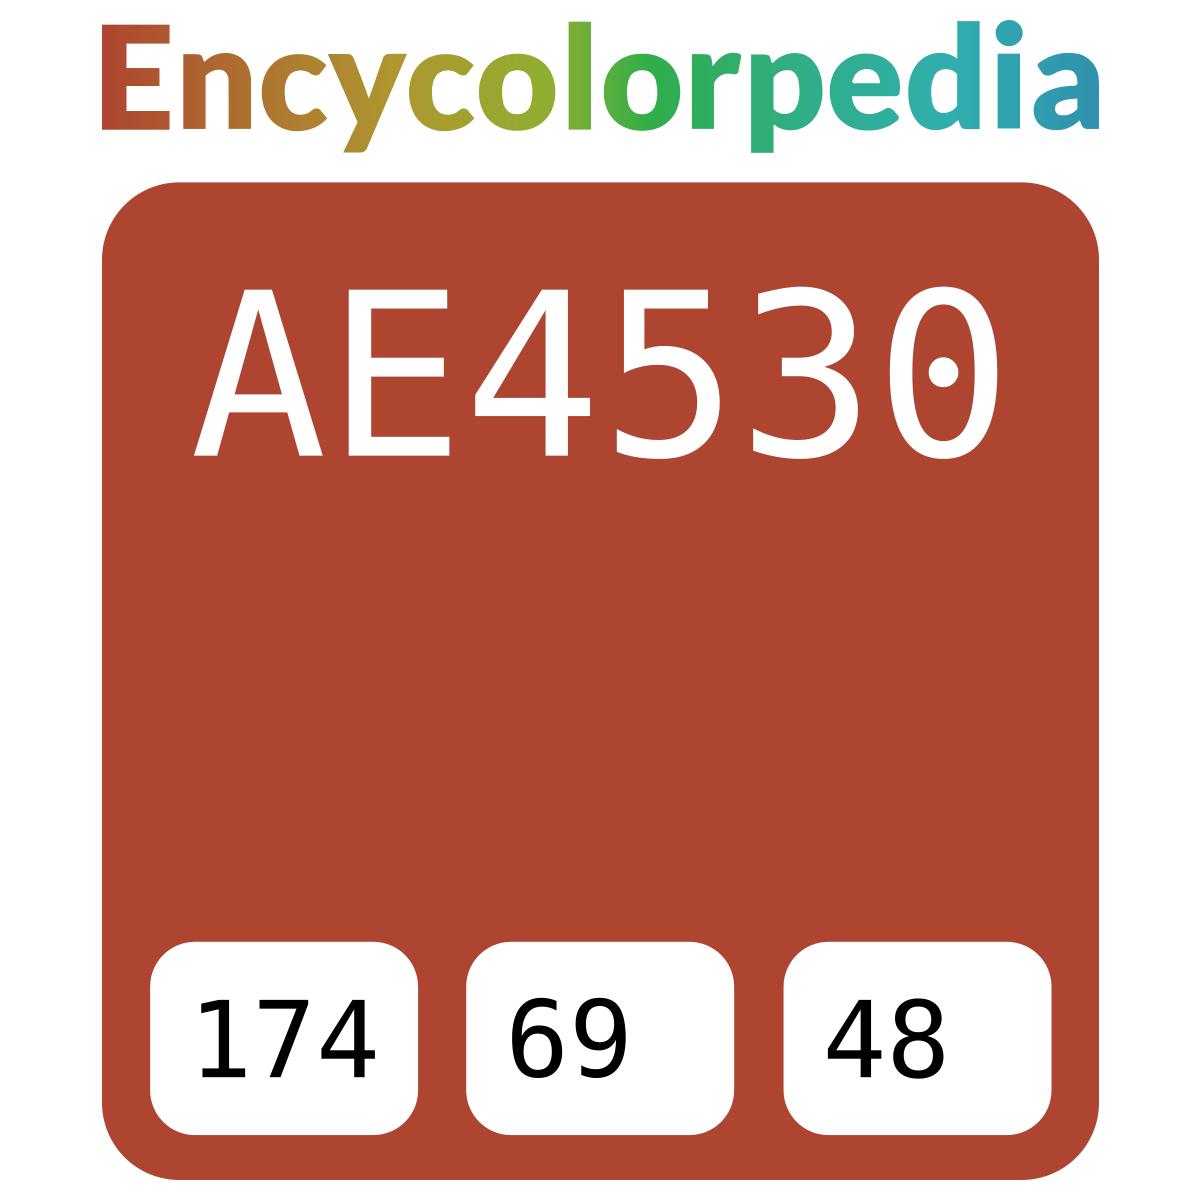 Dulux Australia Red Terra A85 Ae4530 Hex Color Code